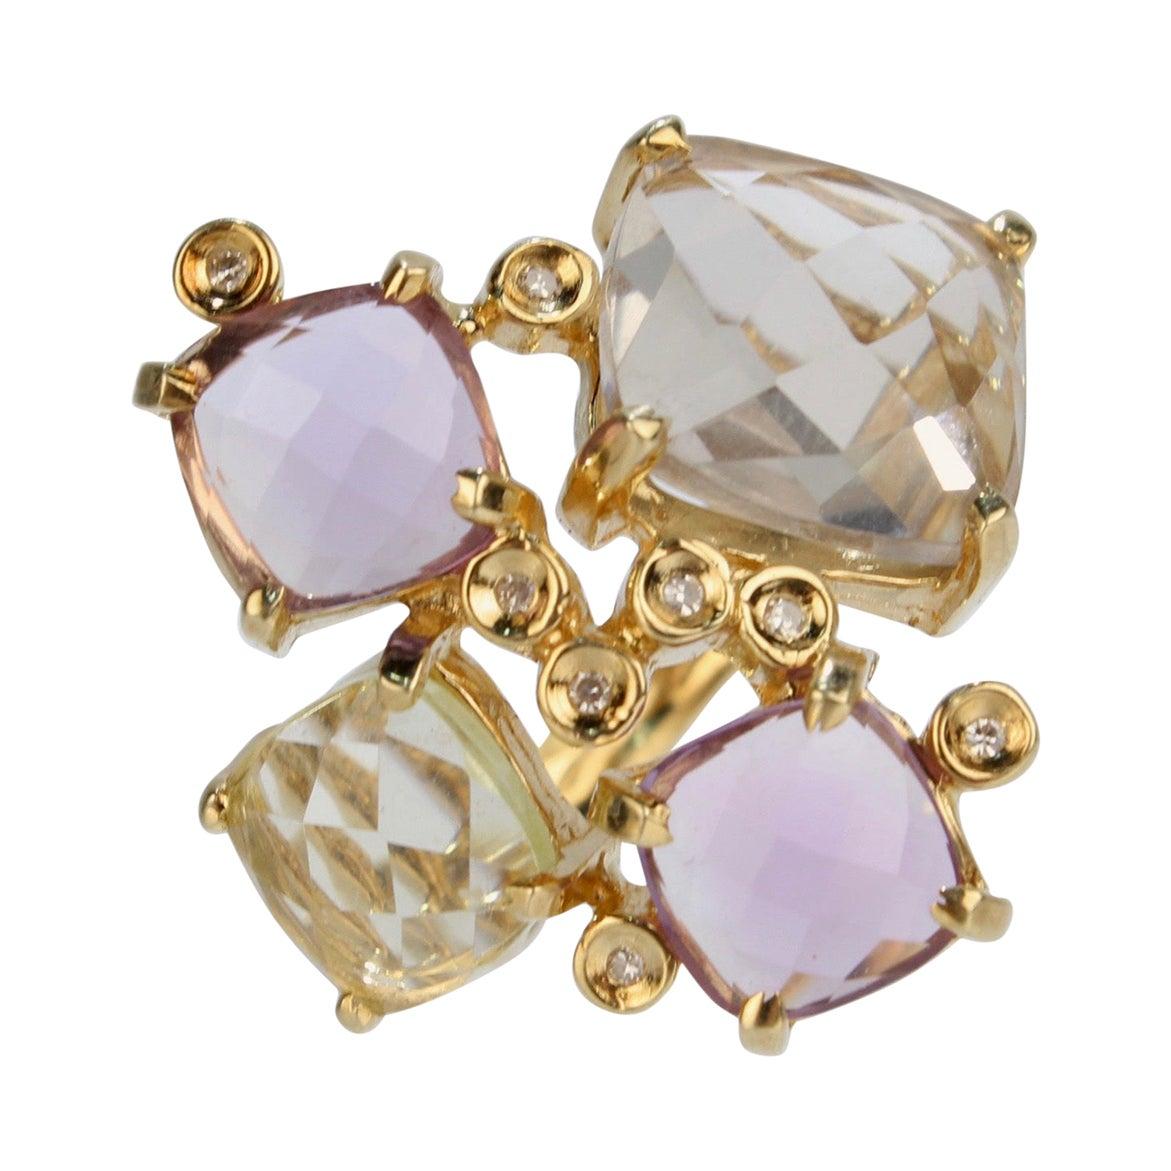 Modernist 18 Karat Gold Citrine Amethyst and Diamond Cluster Cocktail Ring